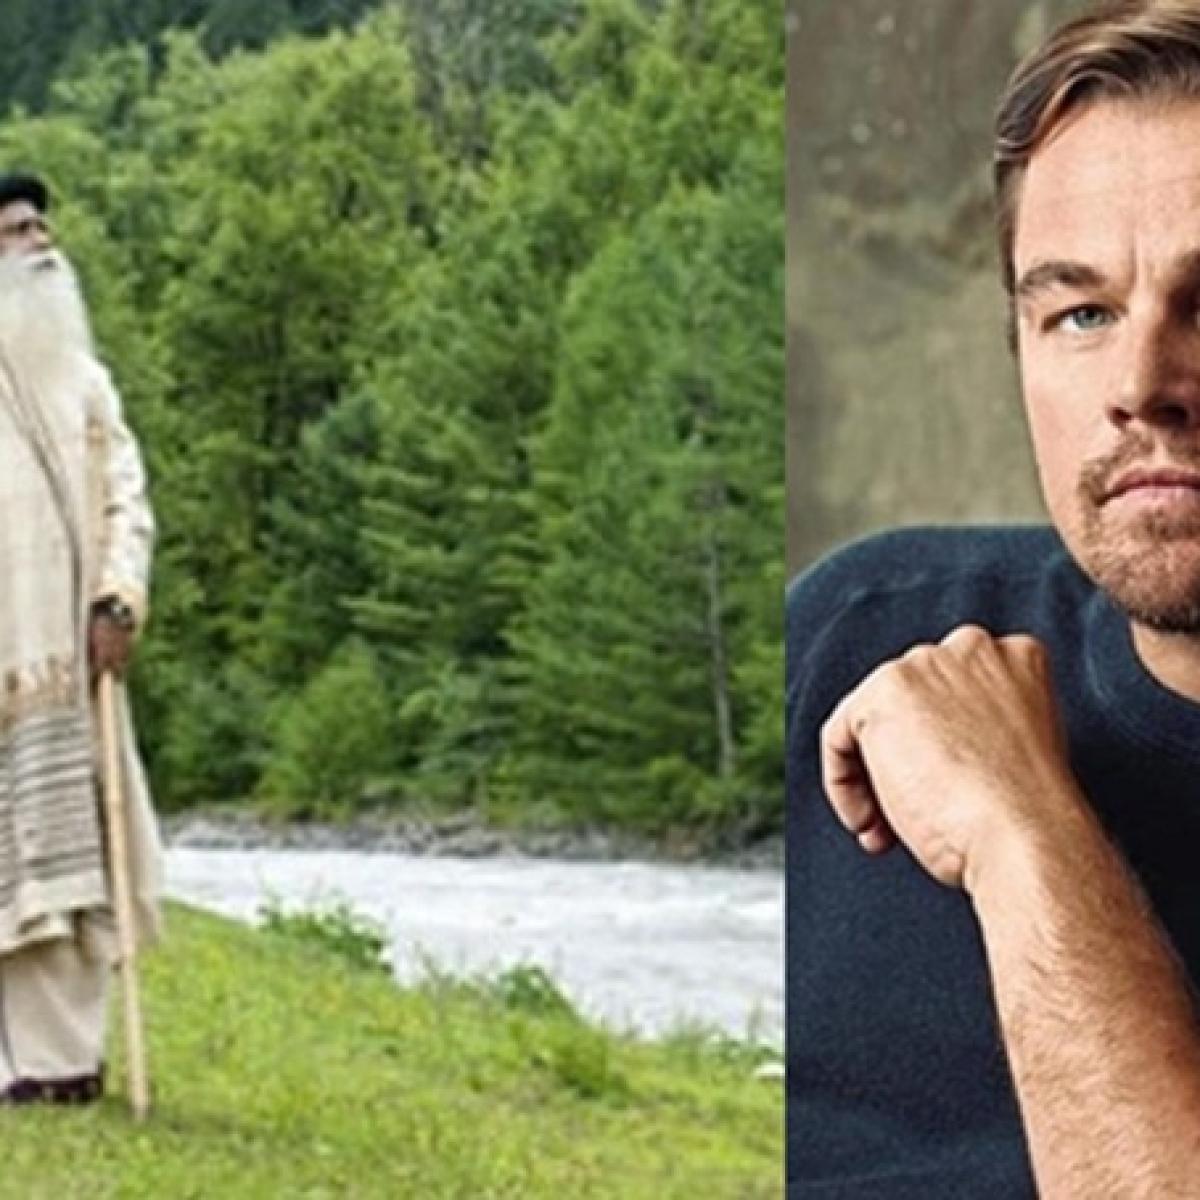 Leonardo DiCaprio supports 'Cauvery Calling' initiated by Sadhguru